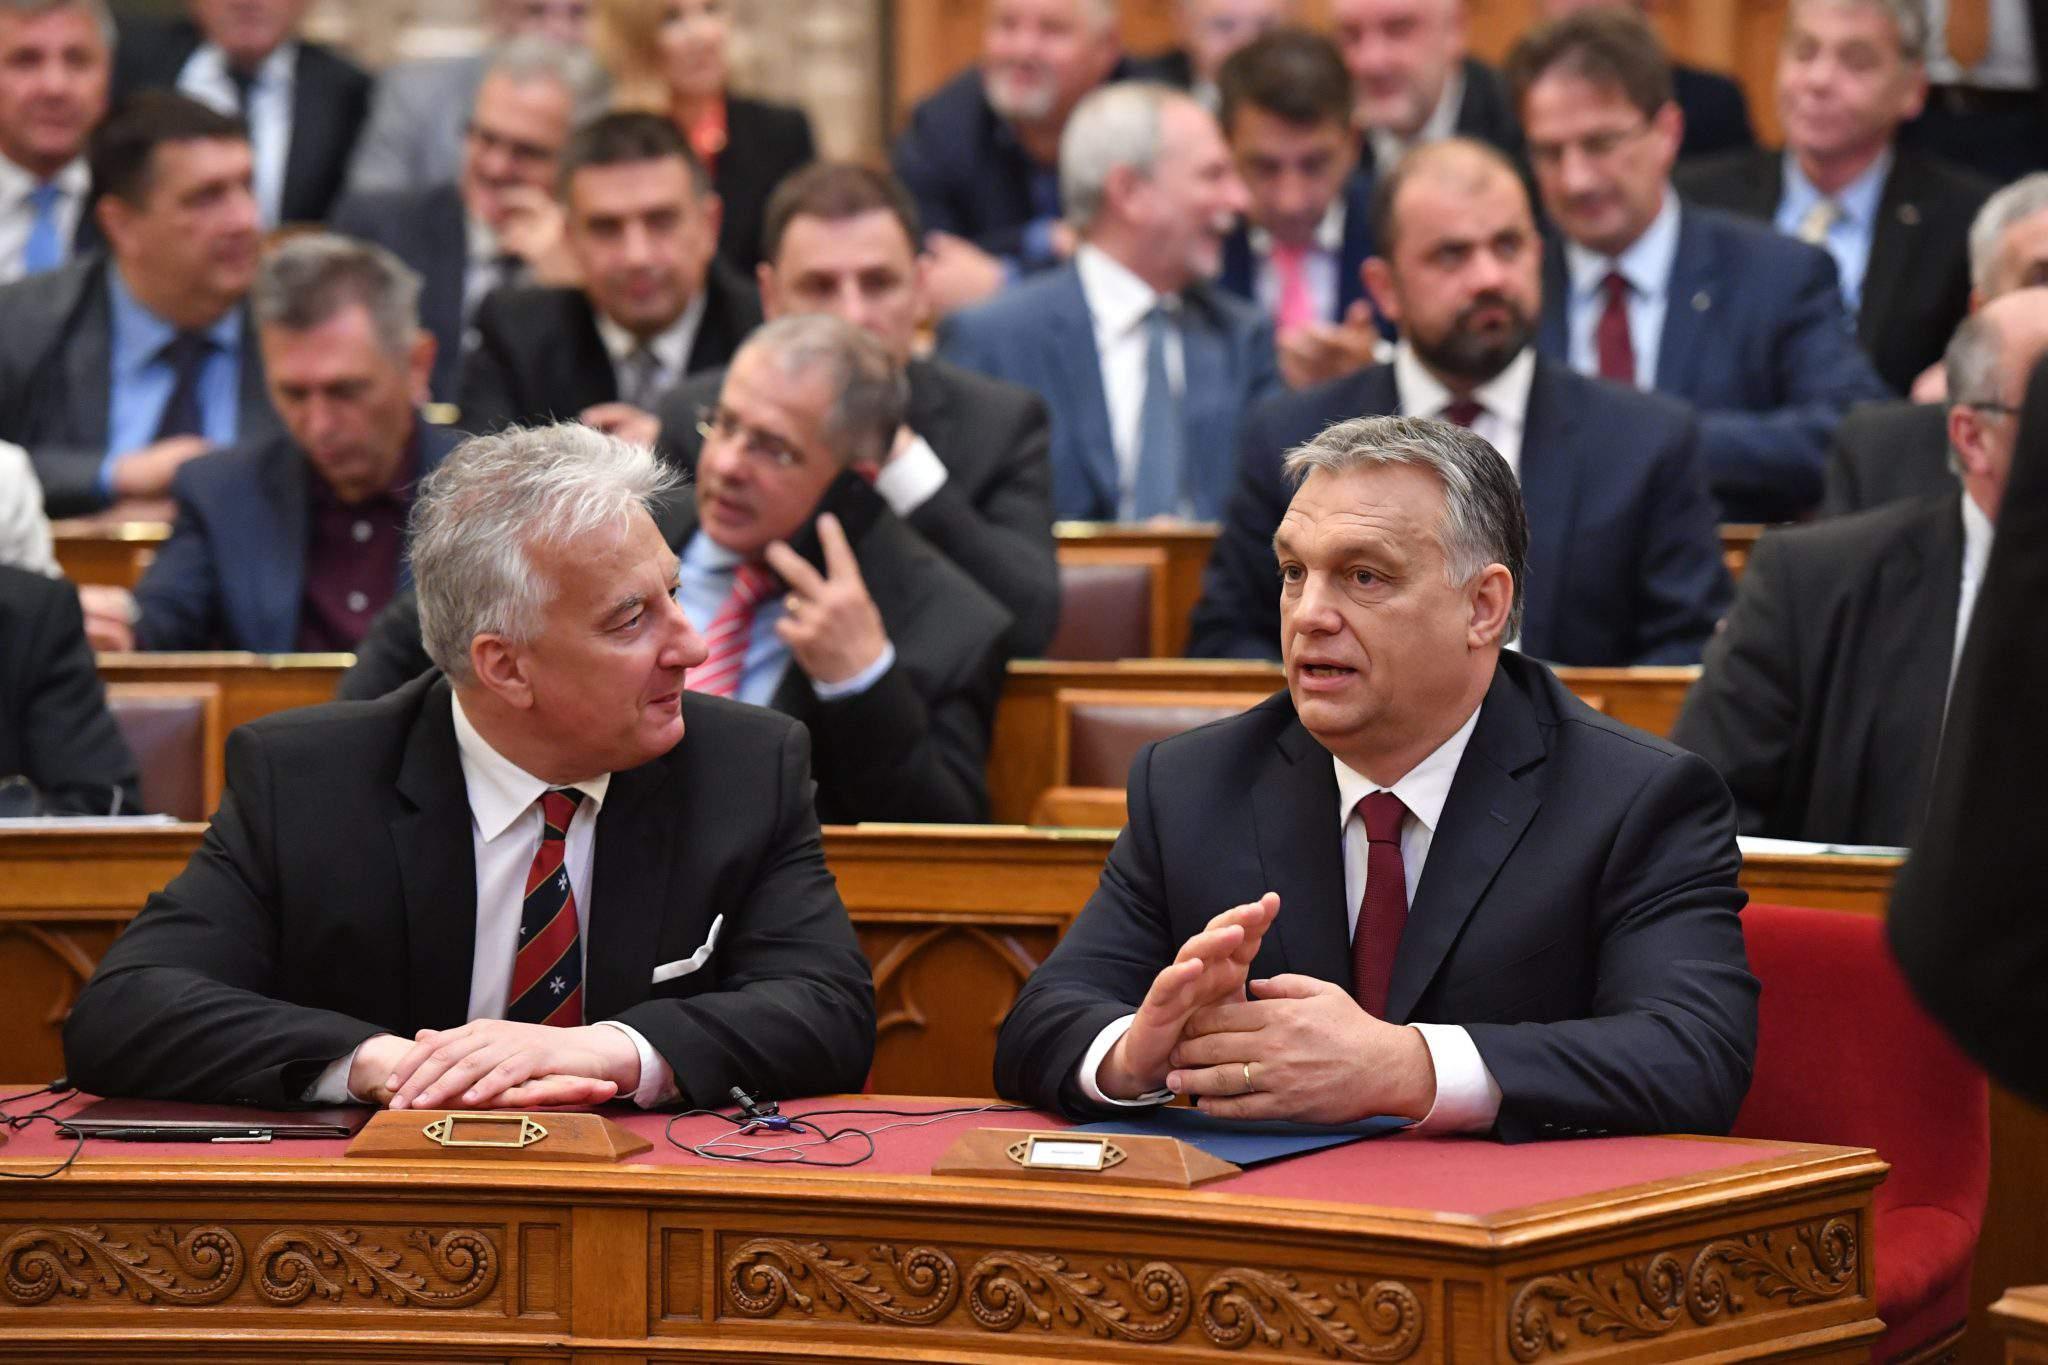 Orbán Semjén Prime Minister Hungary